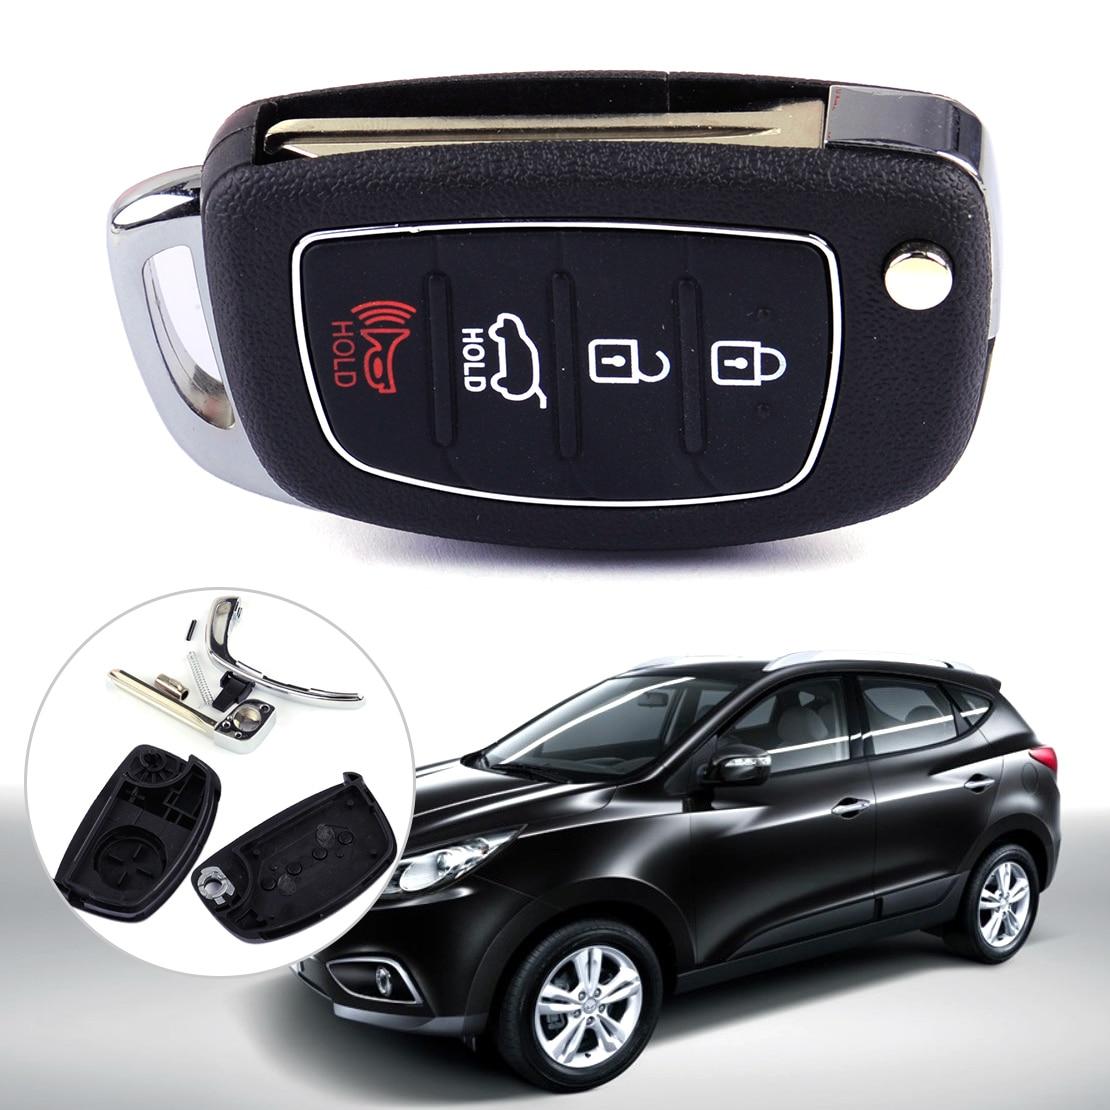 For HYUNDAI ix45 Santa Fe 2013-2014 Flip Key Shell Remote Key Case Fob 4 Buttons